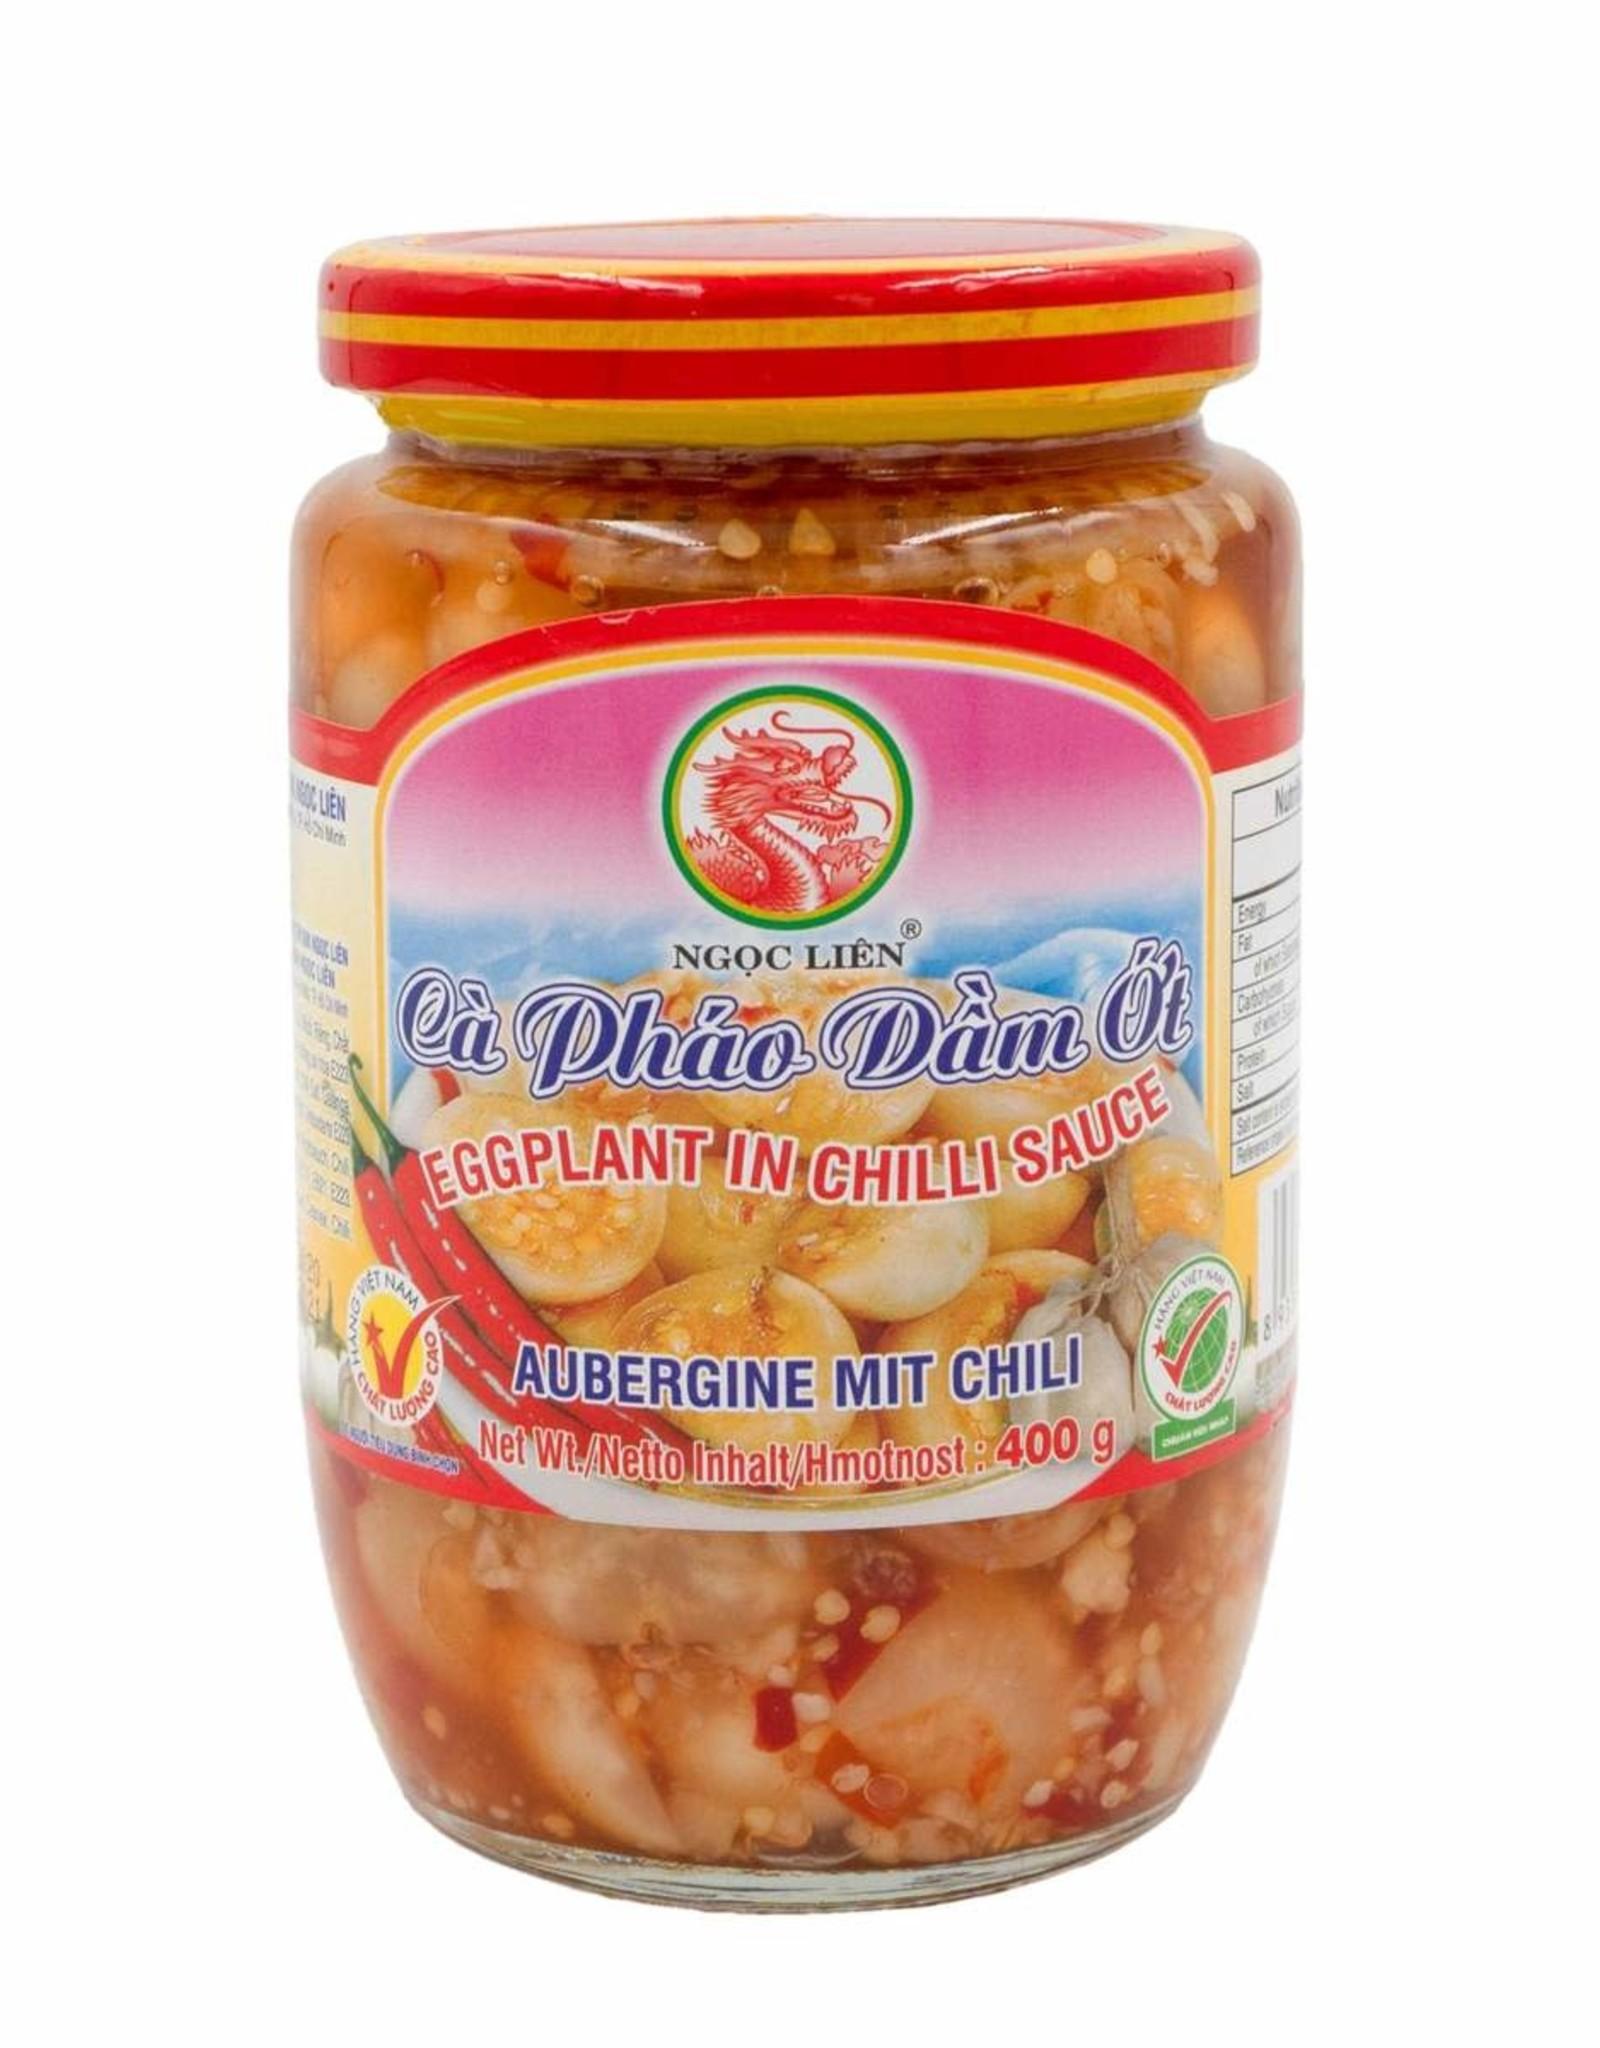 Ngoc Lien Ingemaakte Aubergine En Chili 400 Gr. Ngoc Lien